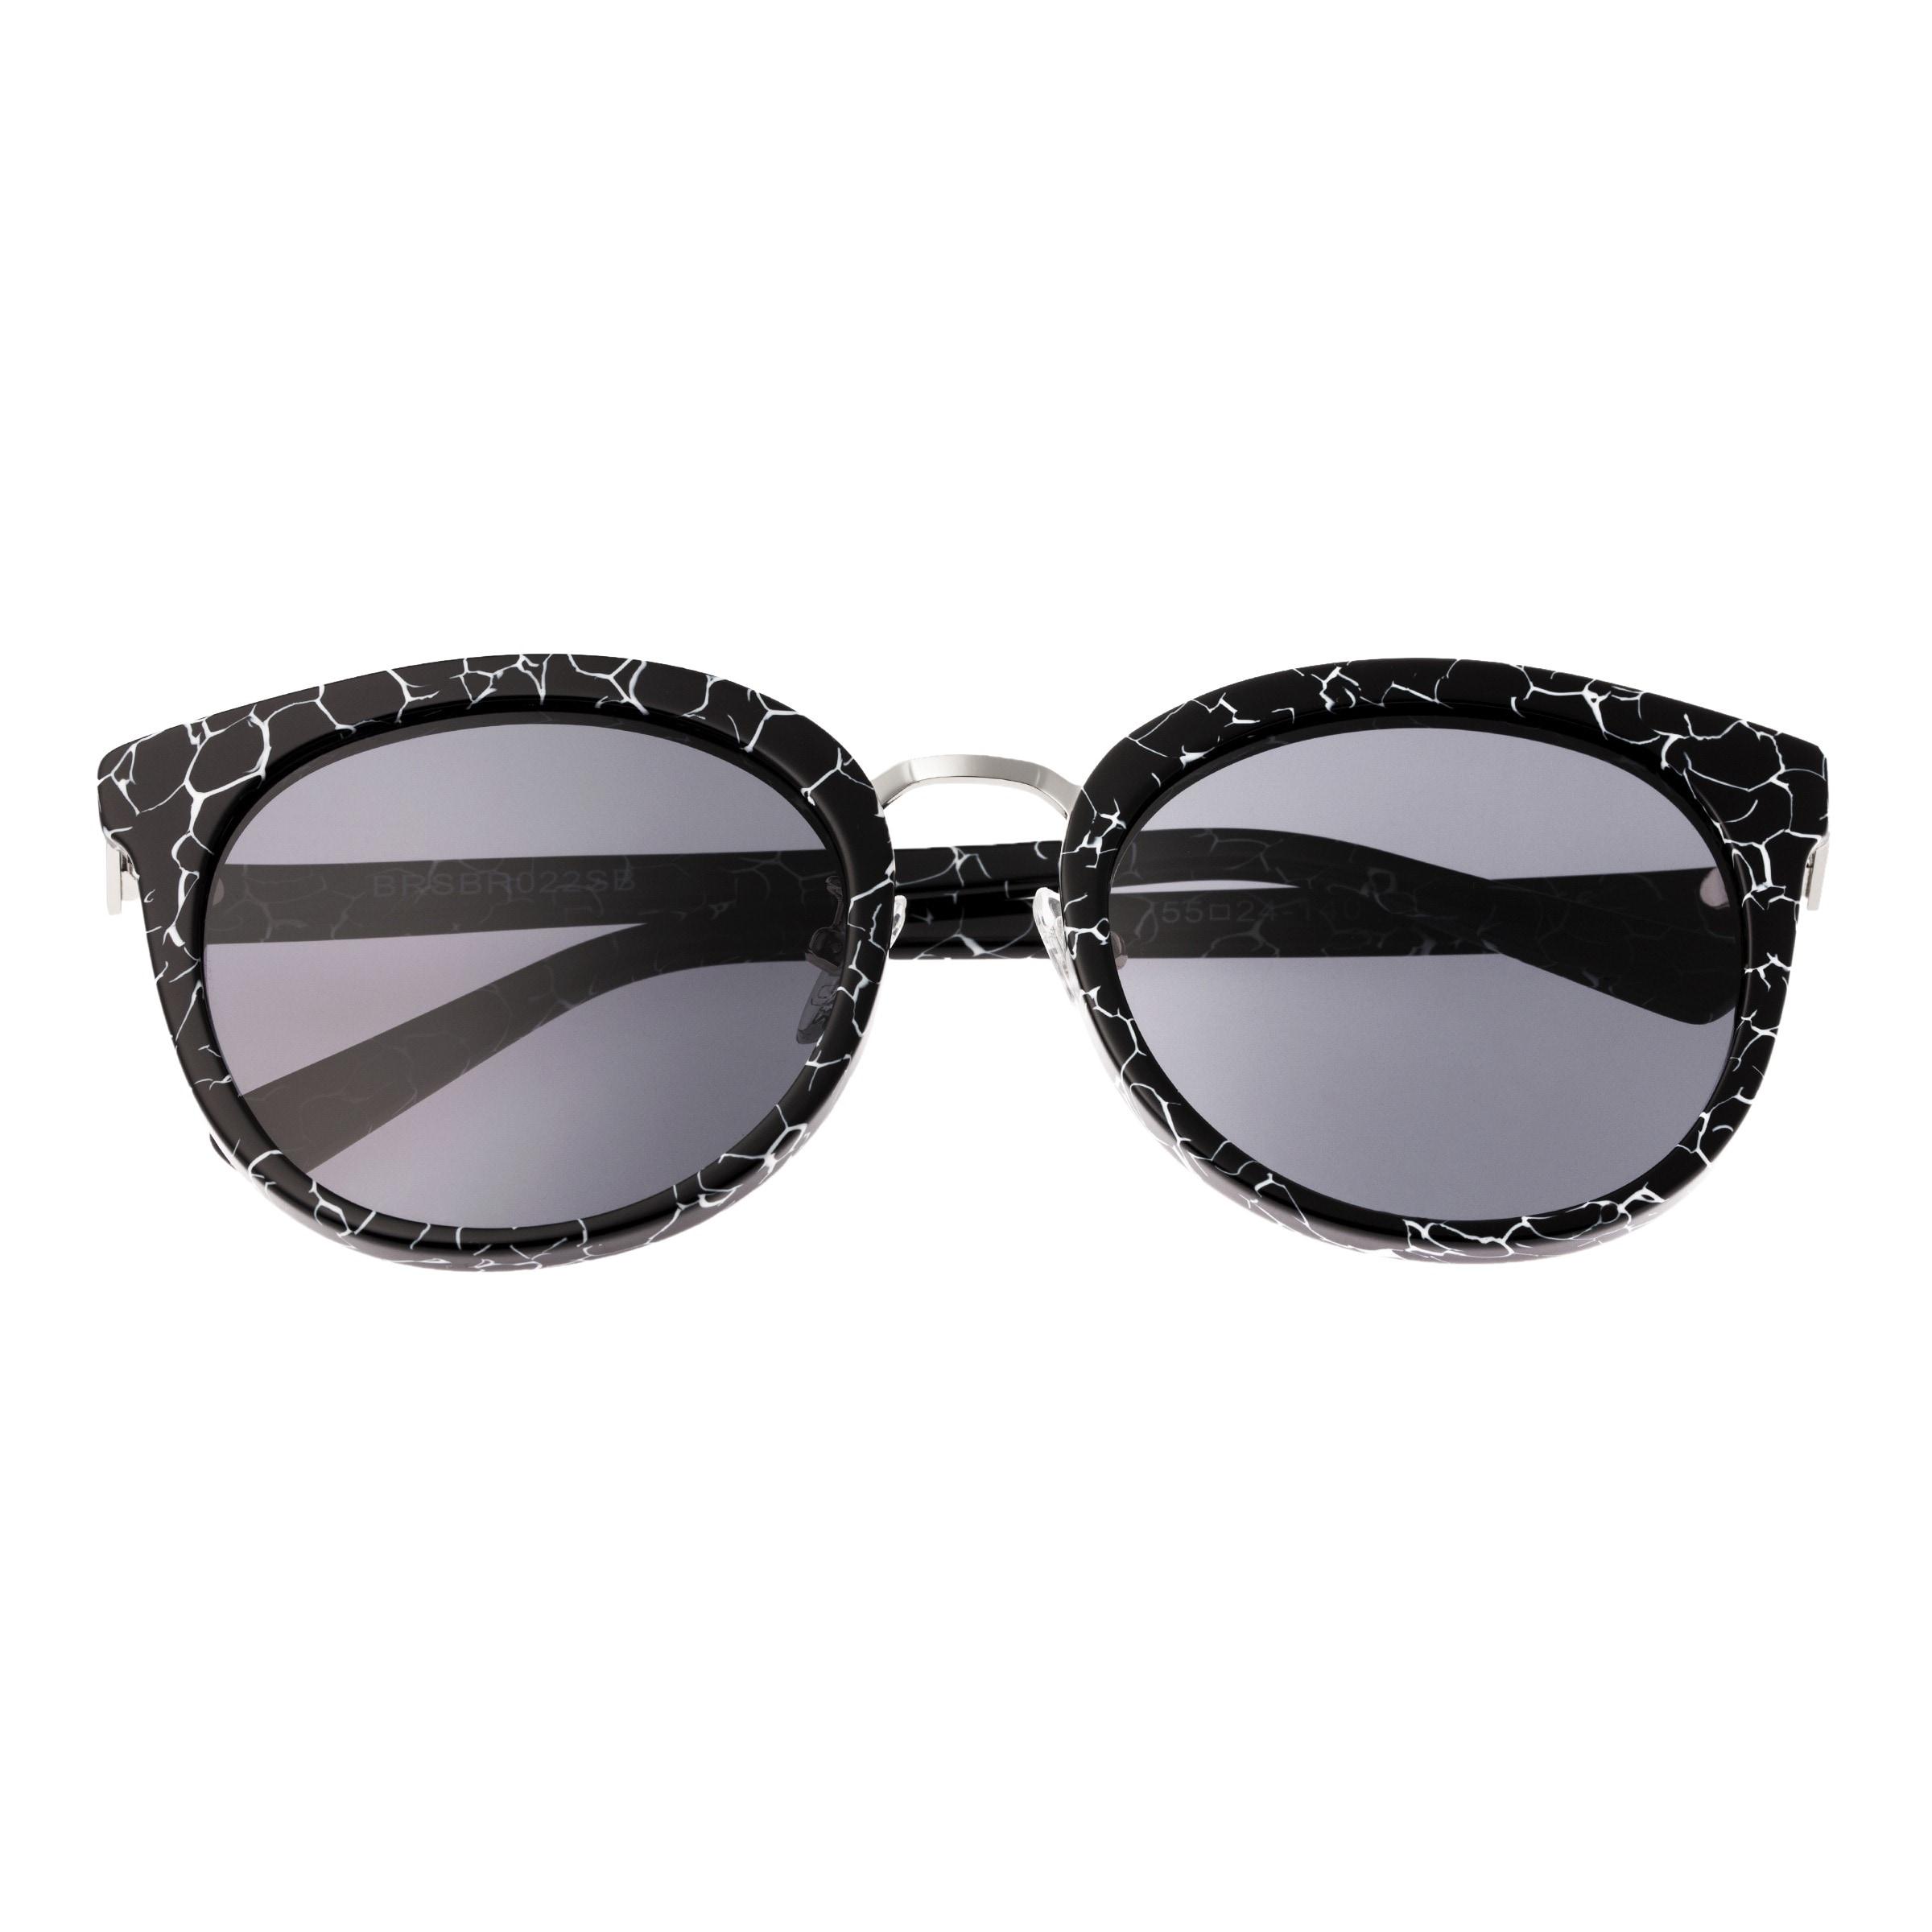 c4e3914e7e Shop Bertha Lucy Women s Acetate Sunglasses - 100% UVA UVB Prorection -  Polarized Lens - Multi - On Sale - Free Shipping Today - Overstock -  22668795